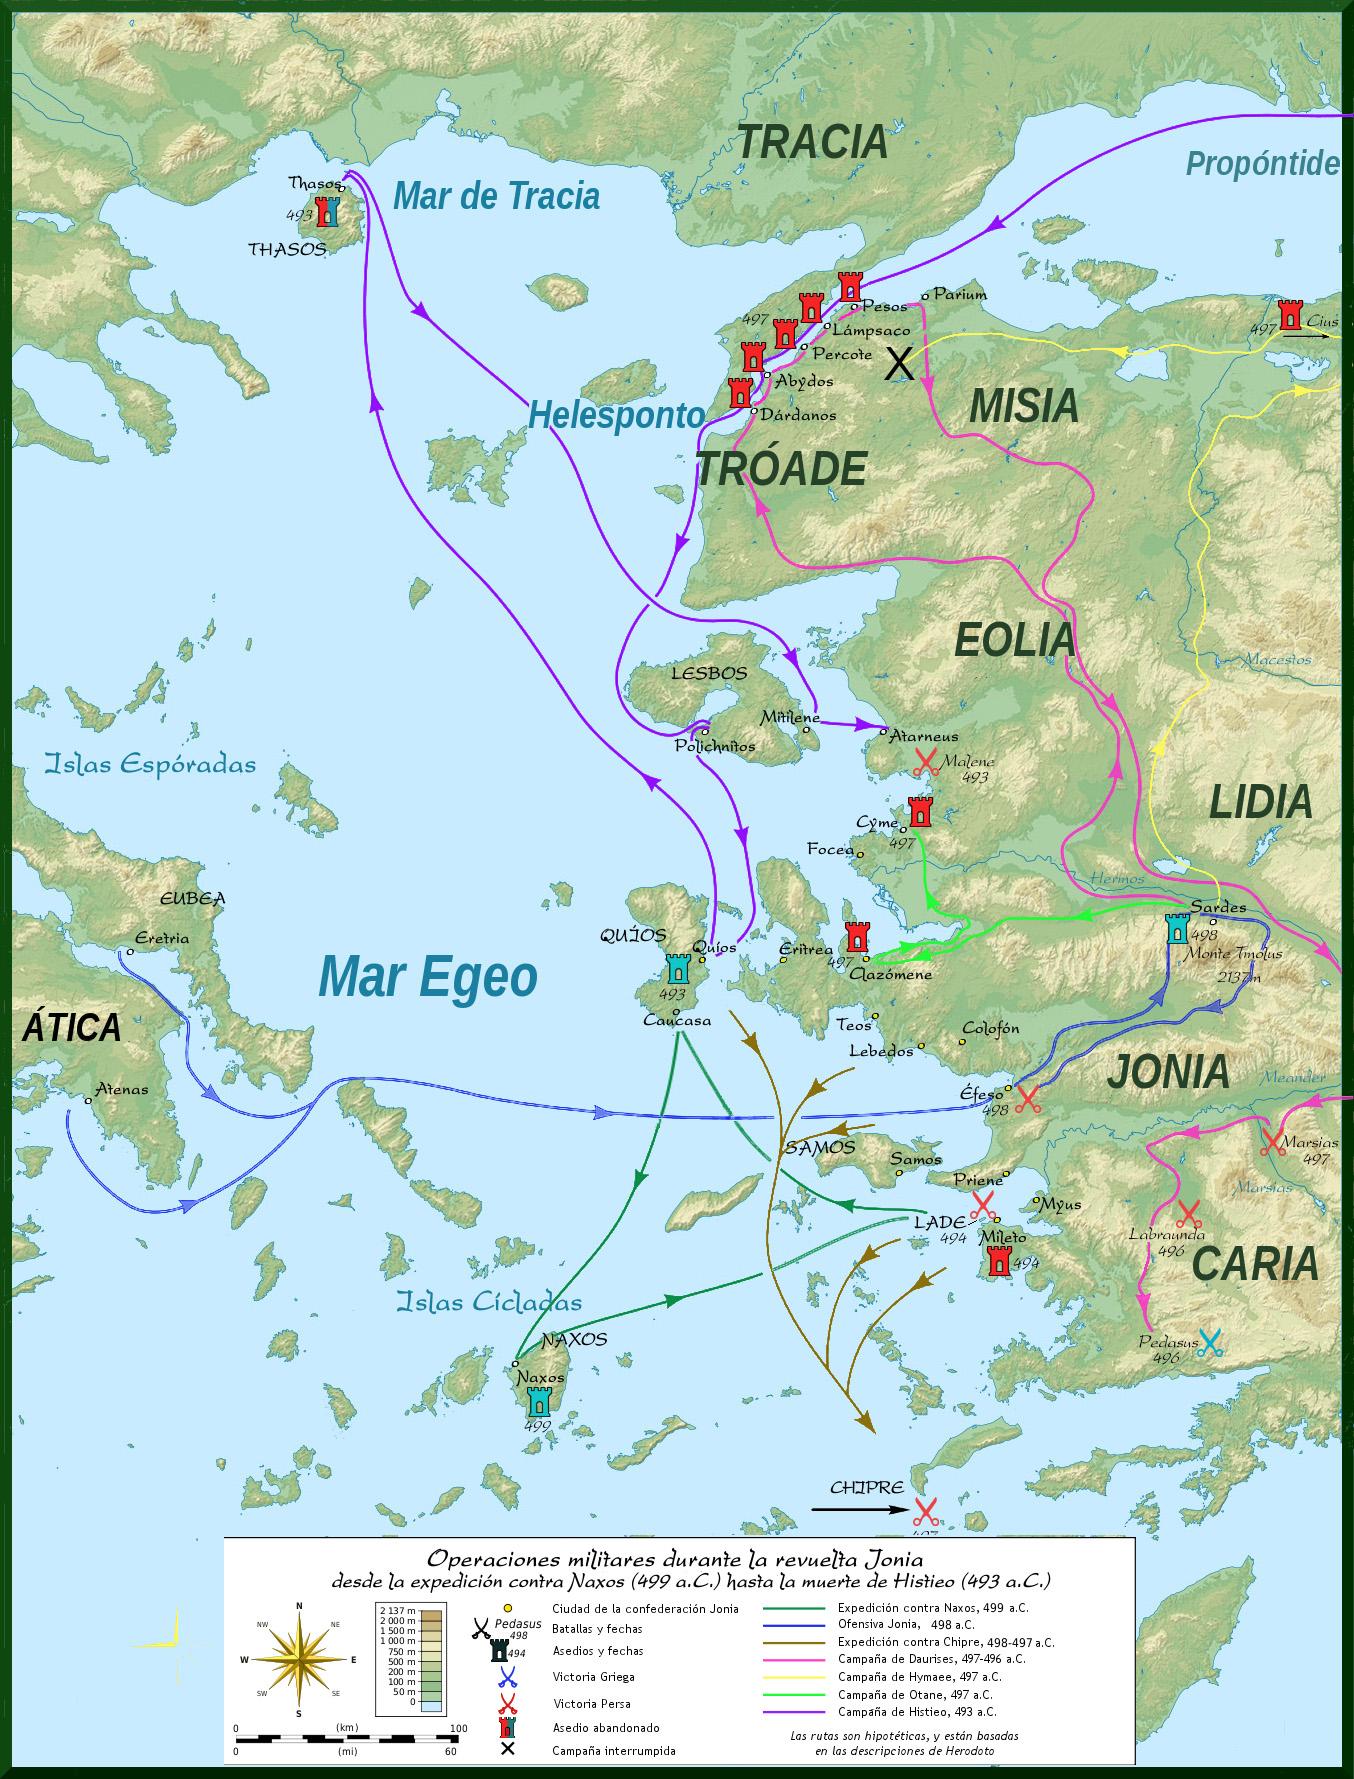 Depiction of Sitio de Naxos